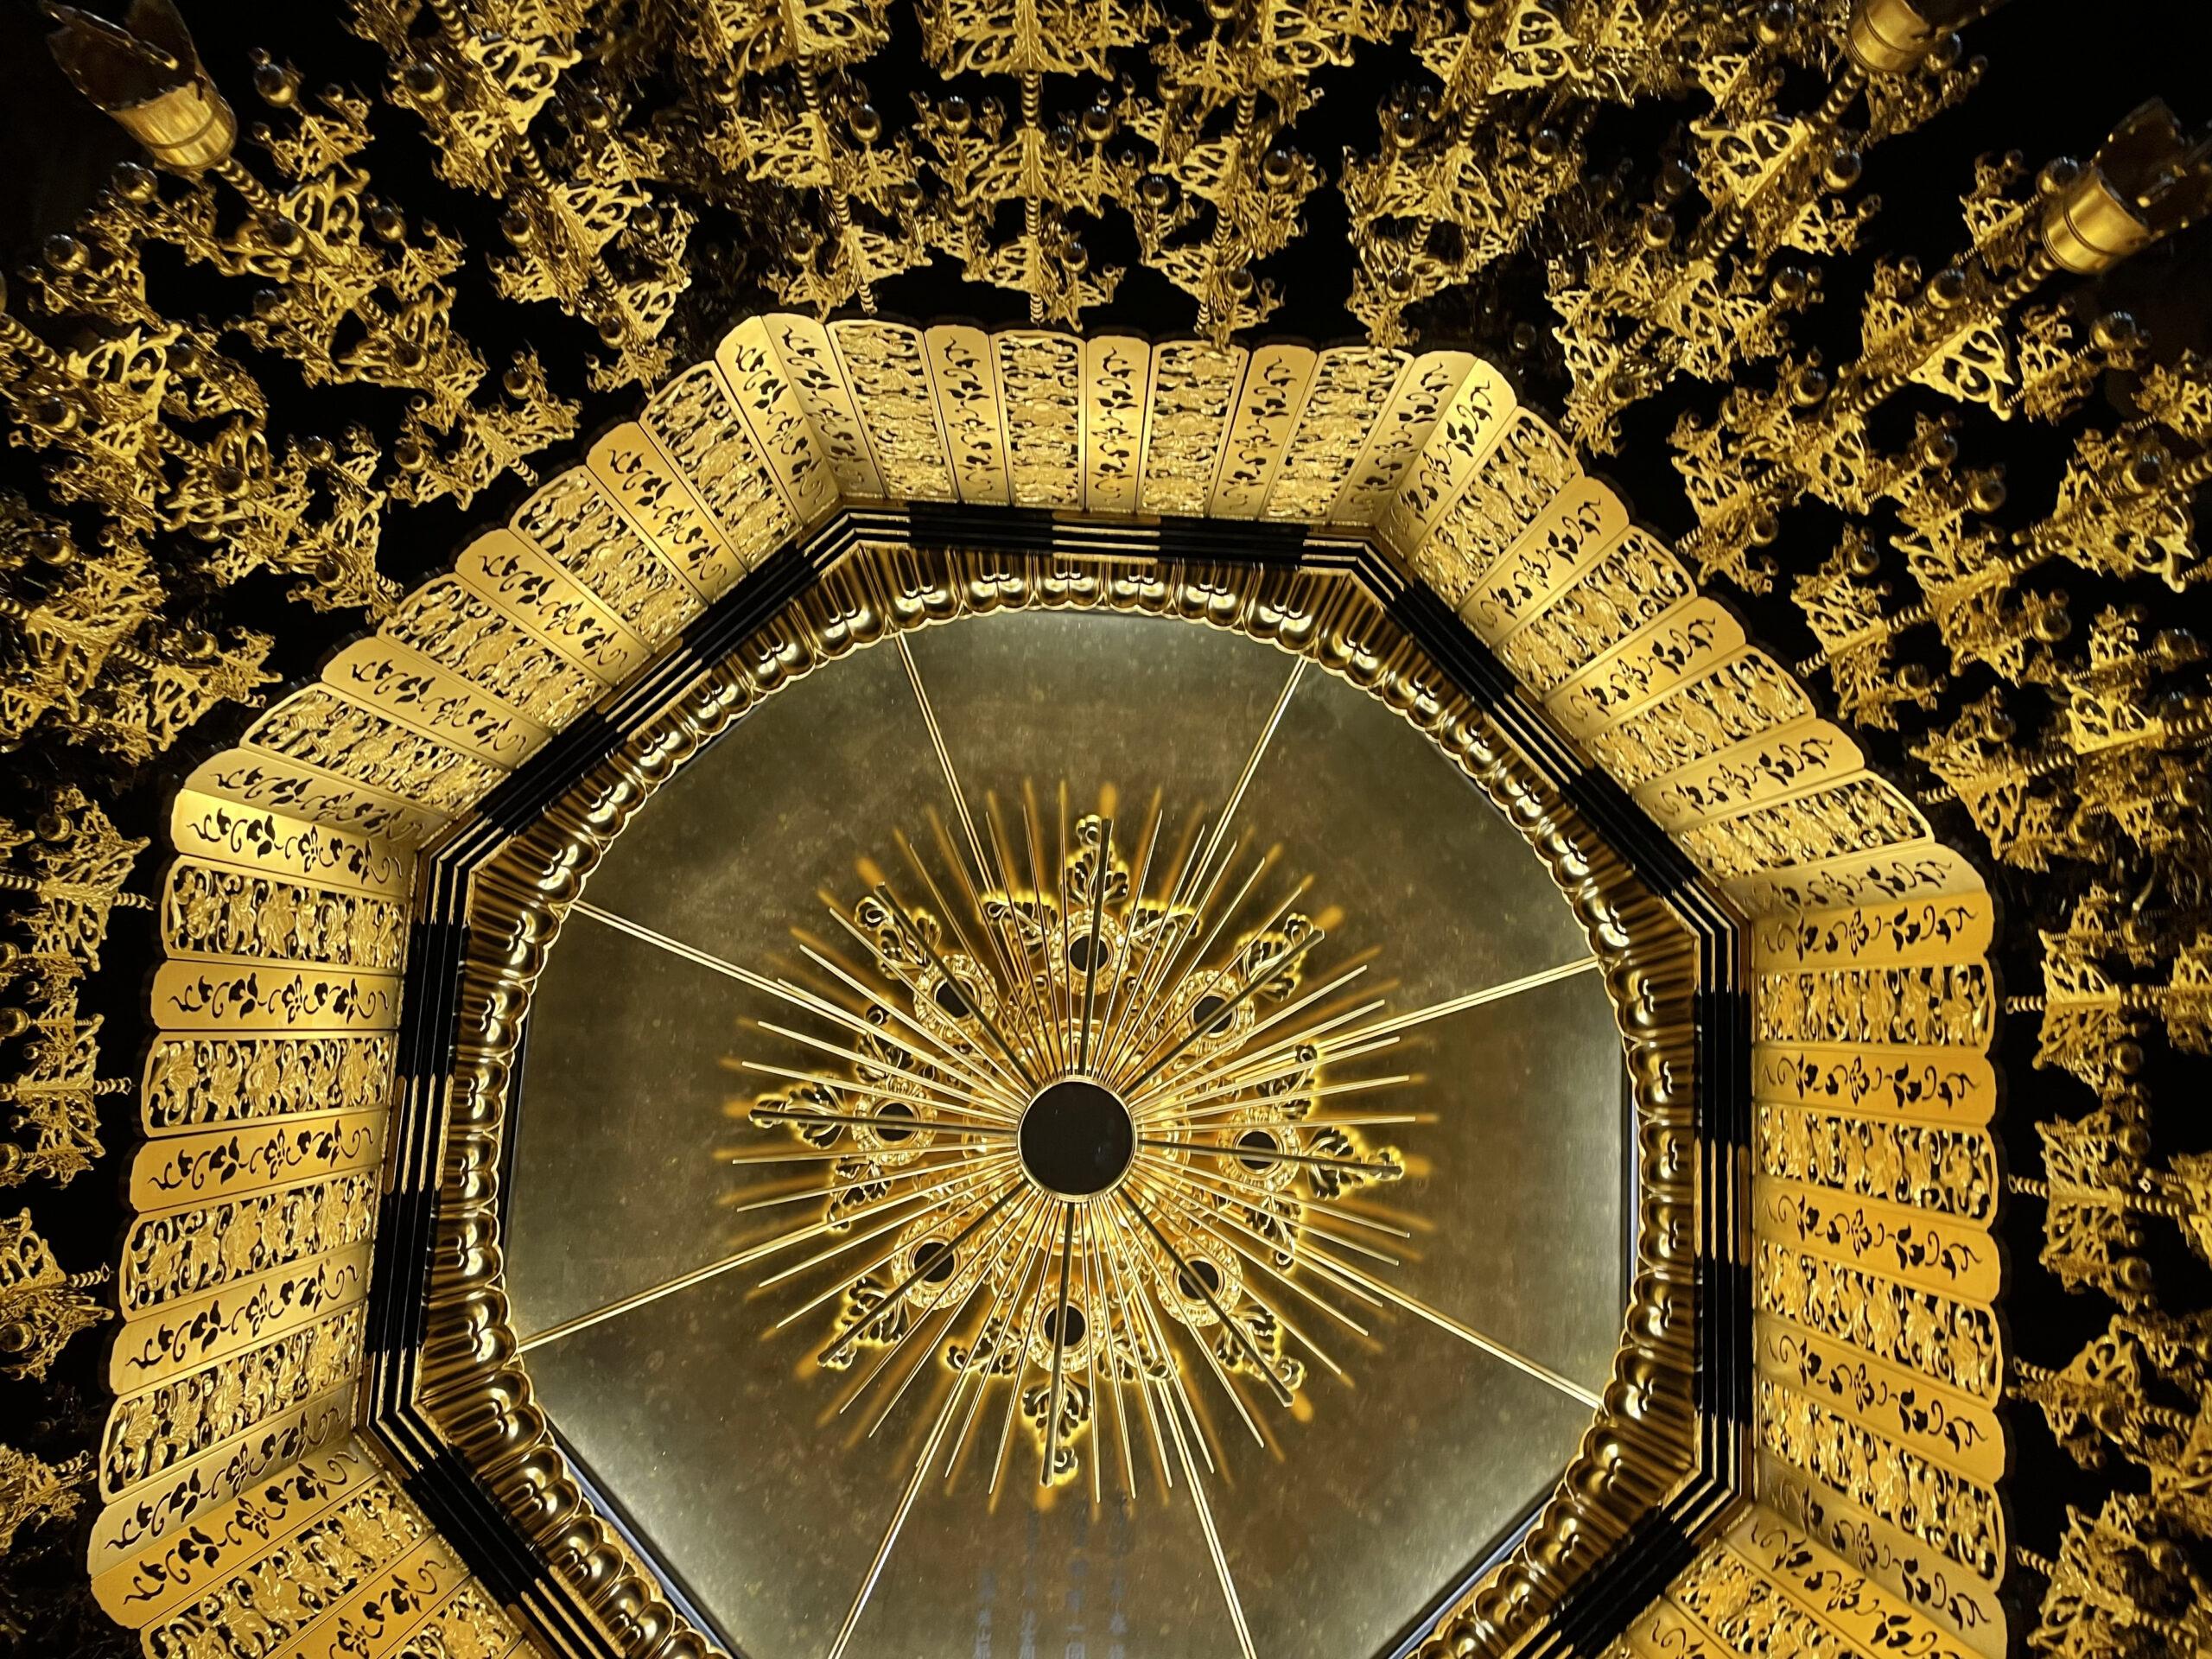 最乗寺本堂の天井